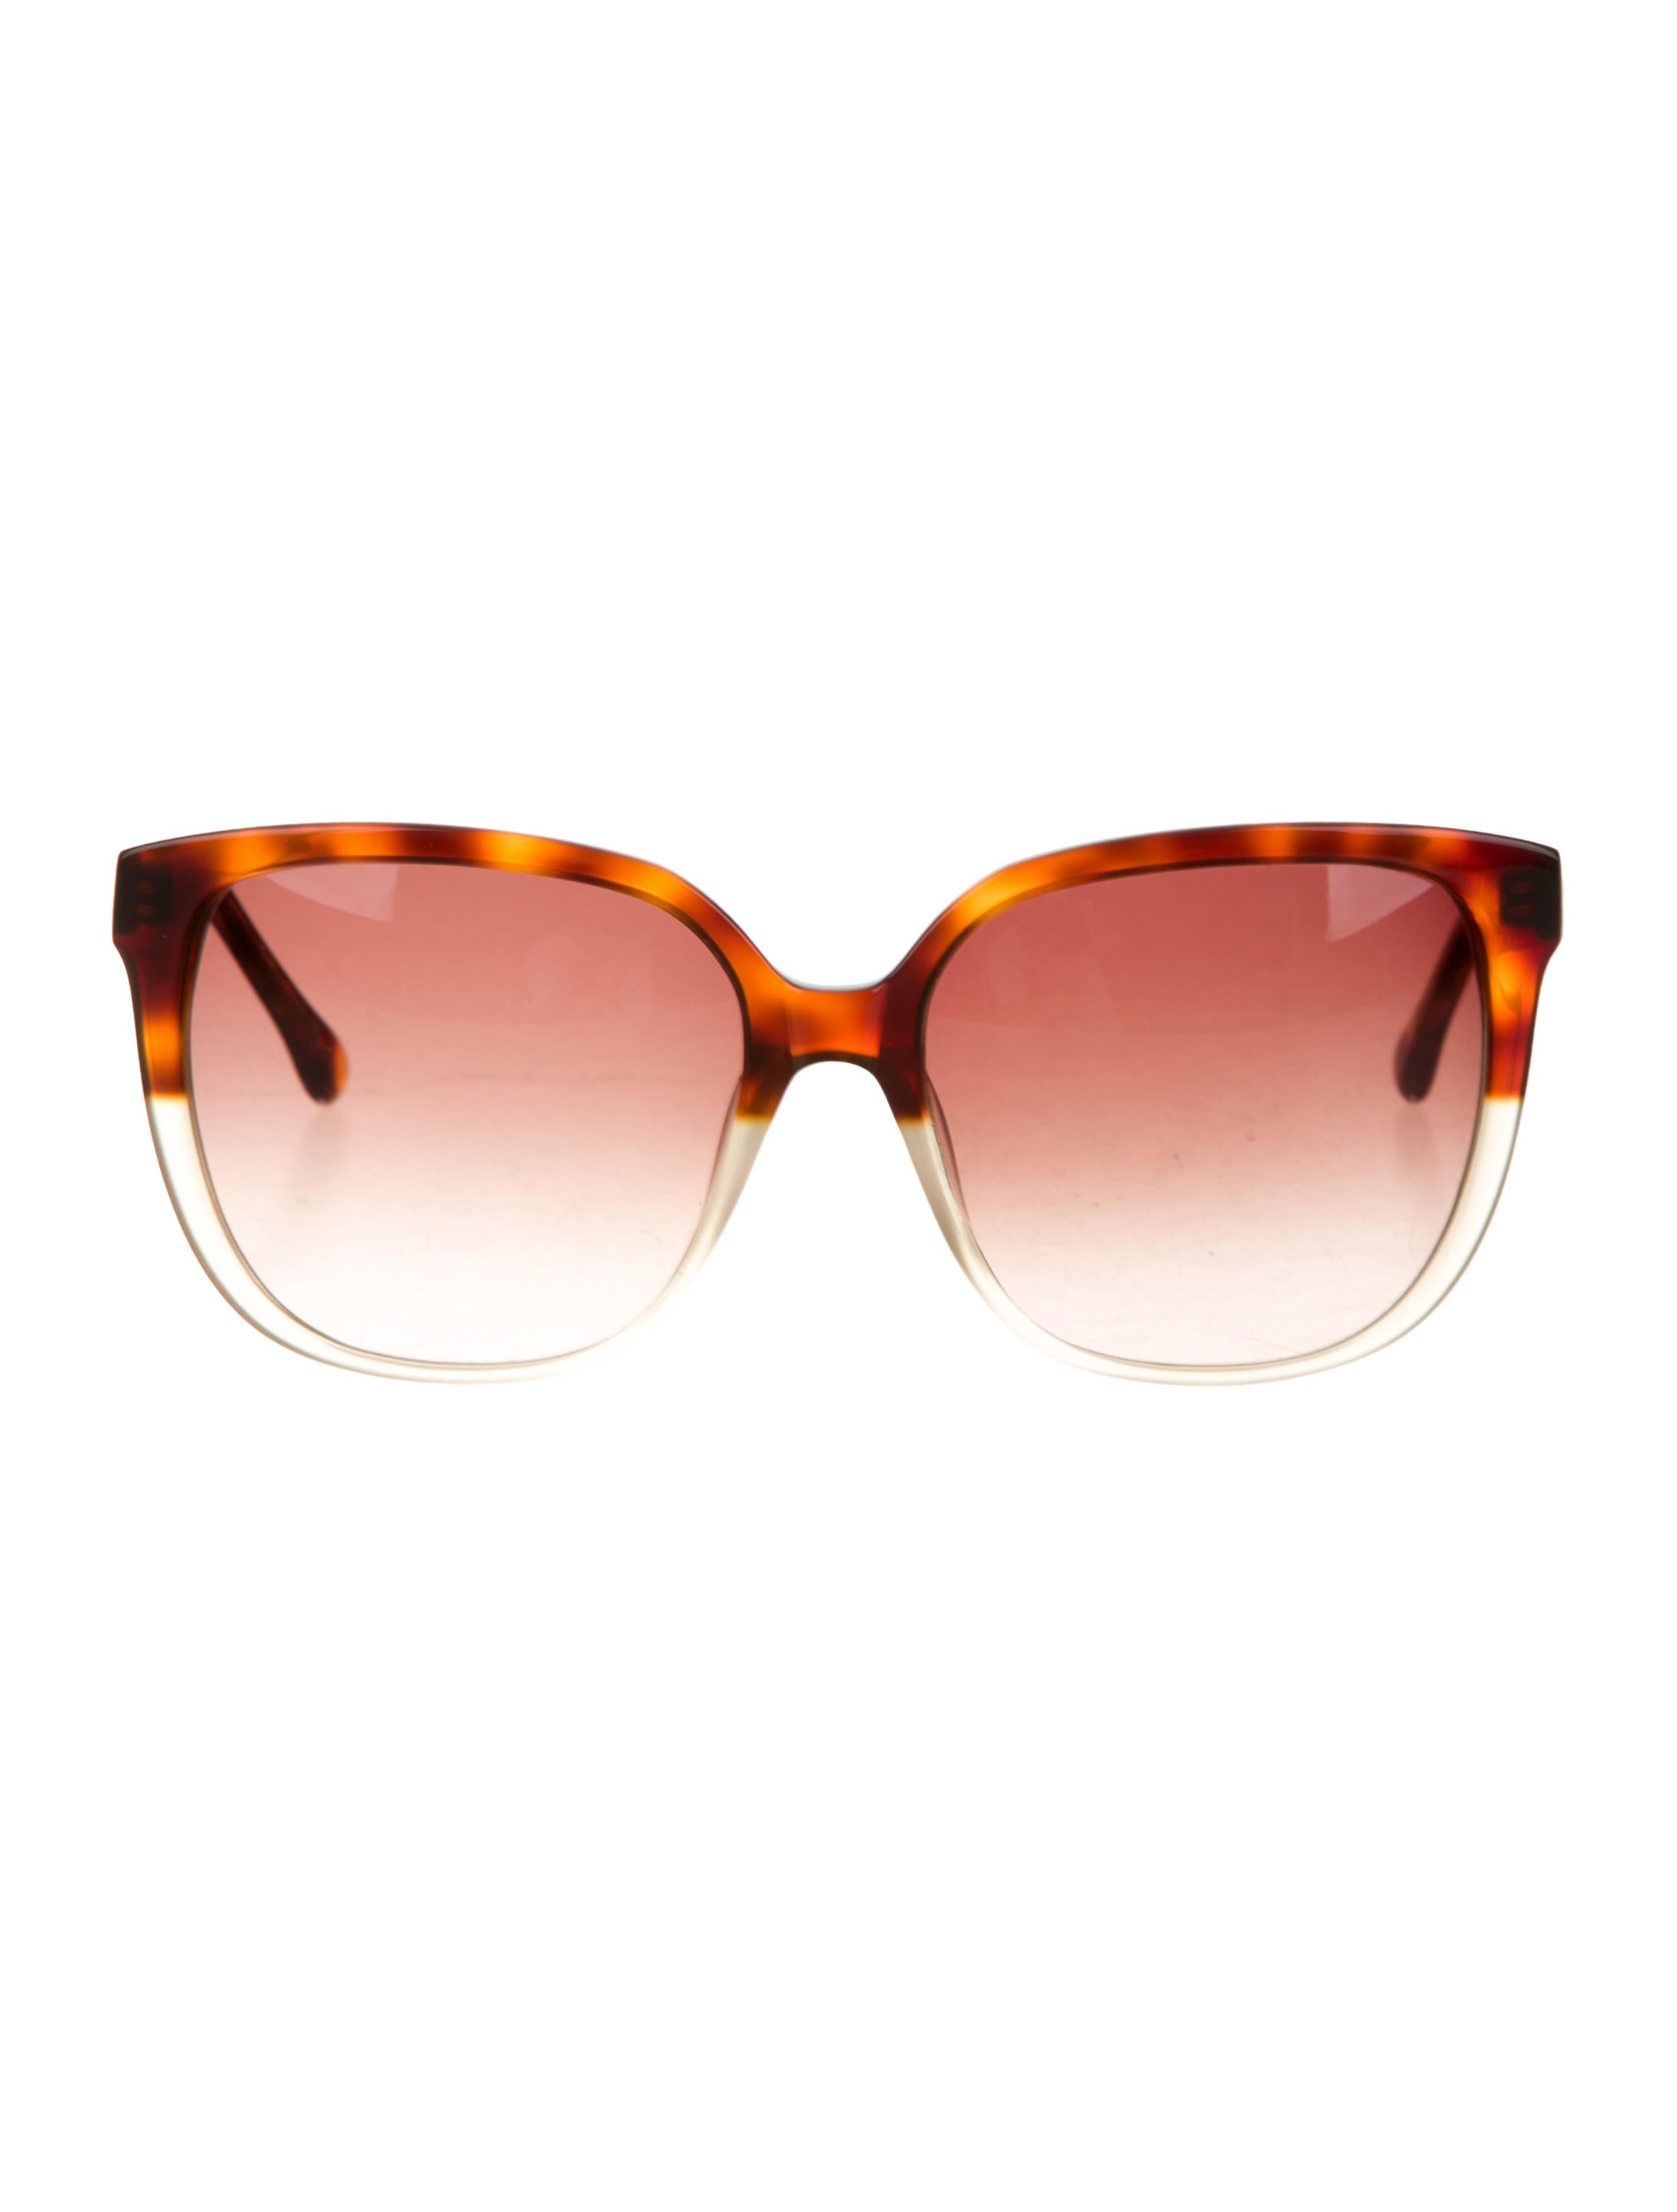 1cc13c1e33 Elmont Sunglasses